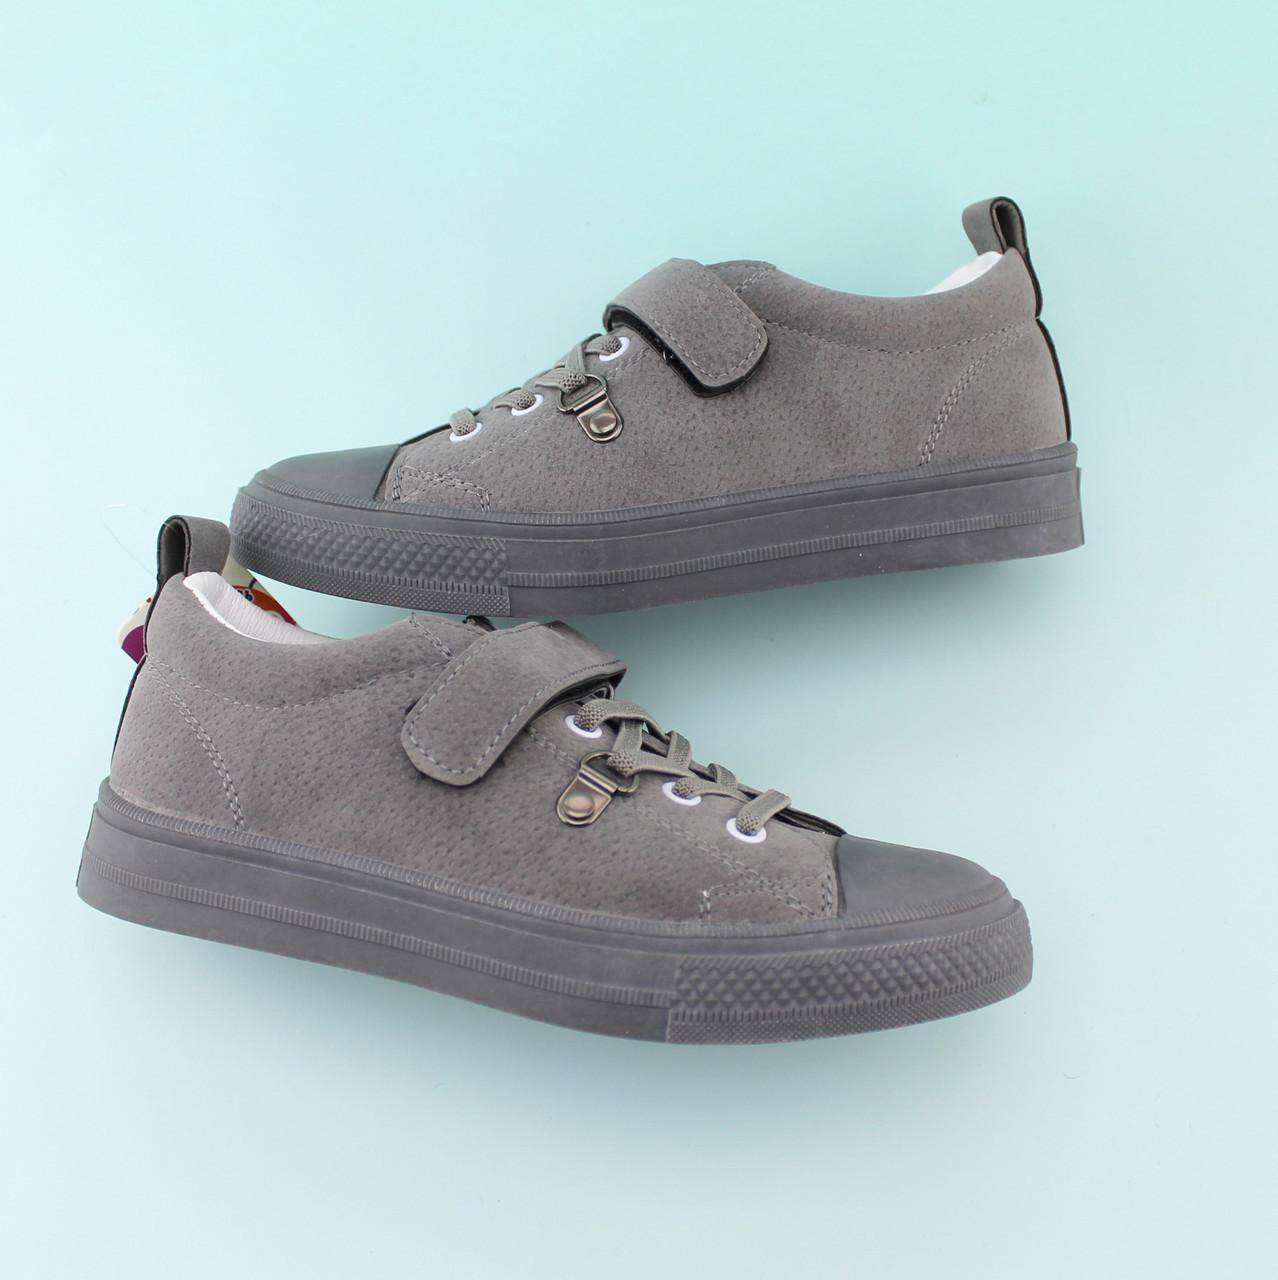 3e5a3a1a6 Детские демисезонные кроссовки Серые тм JG размер 31,32,34 - BonKids -  детский